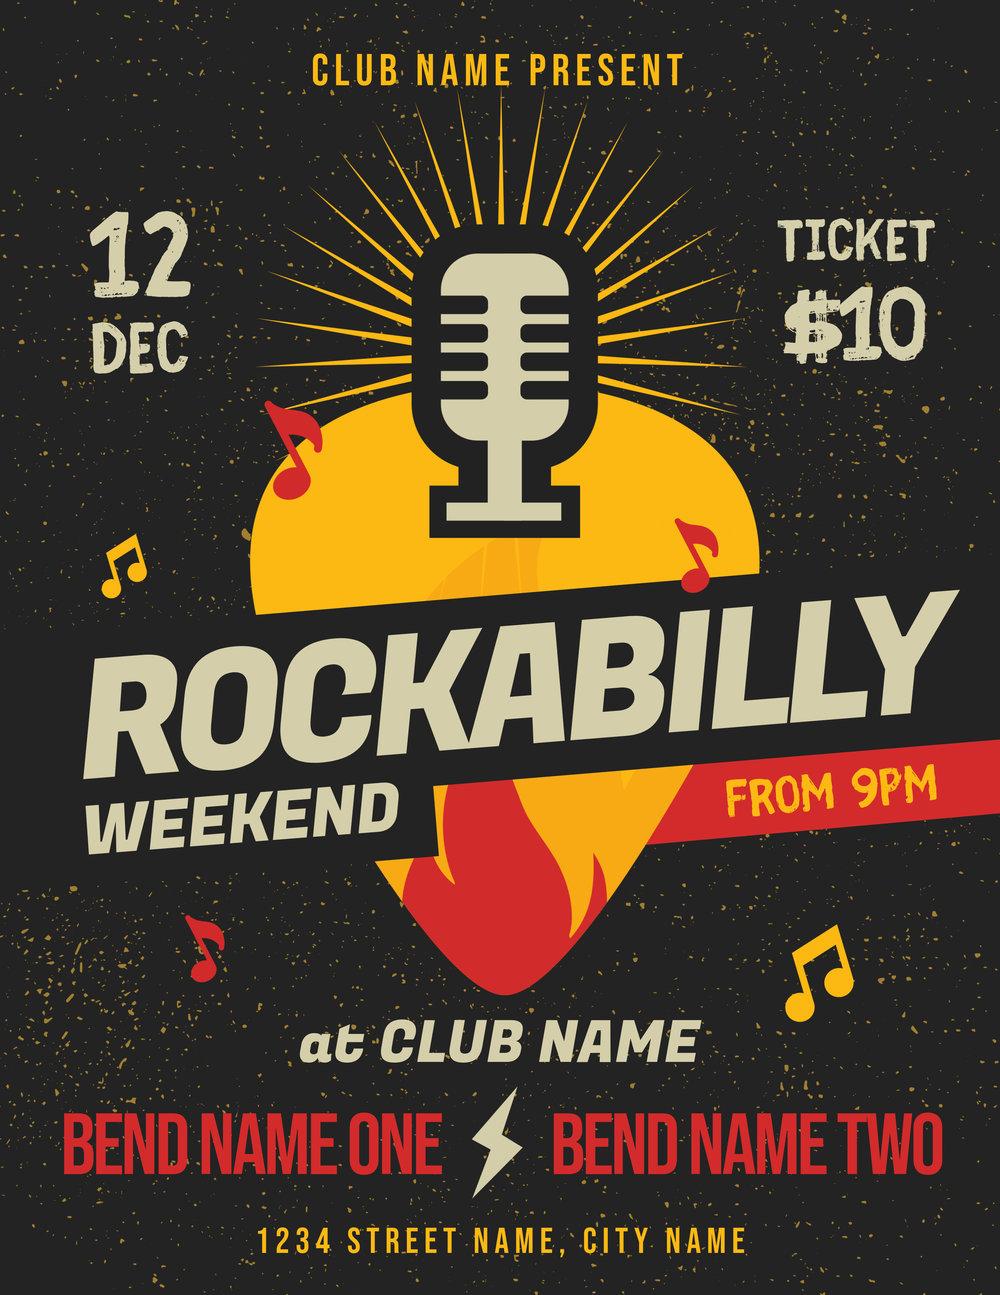 Copy of Rockabilly Music Event Flyer Template.jpg